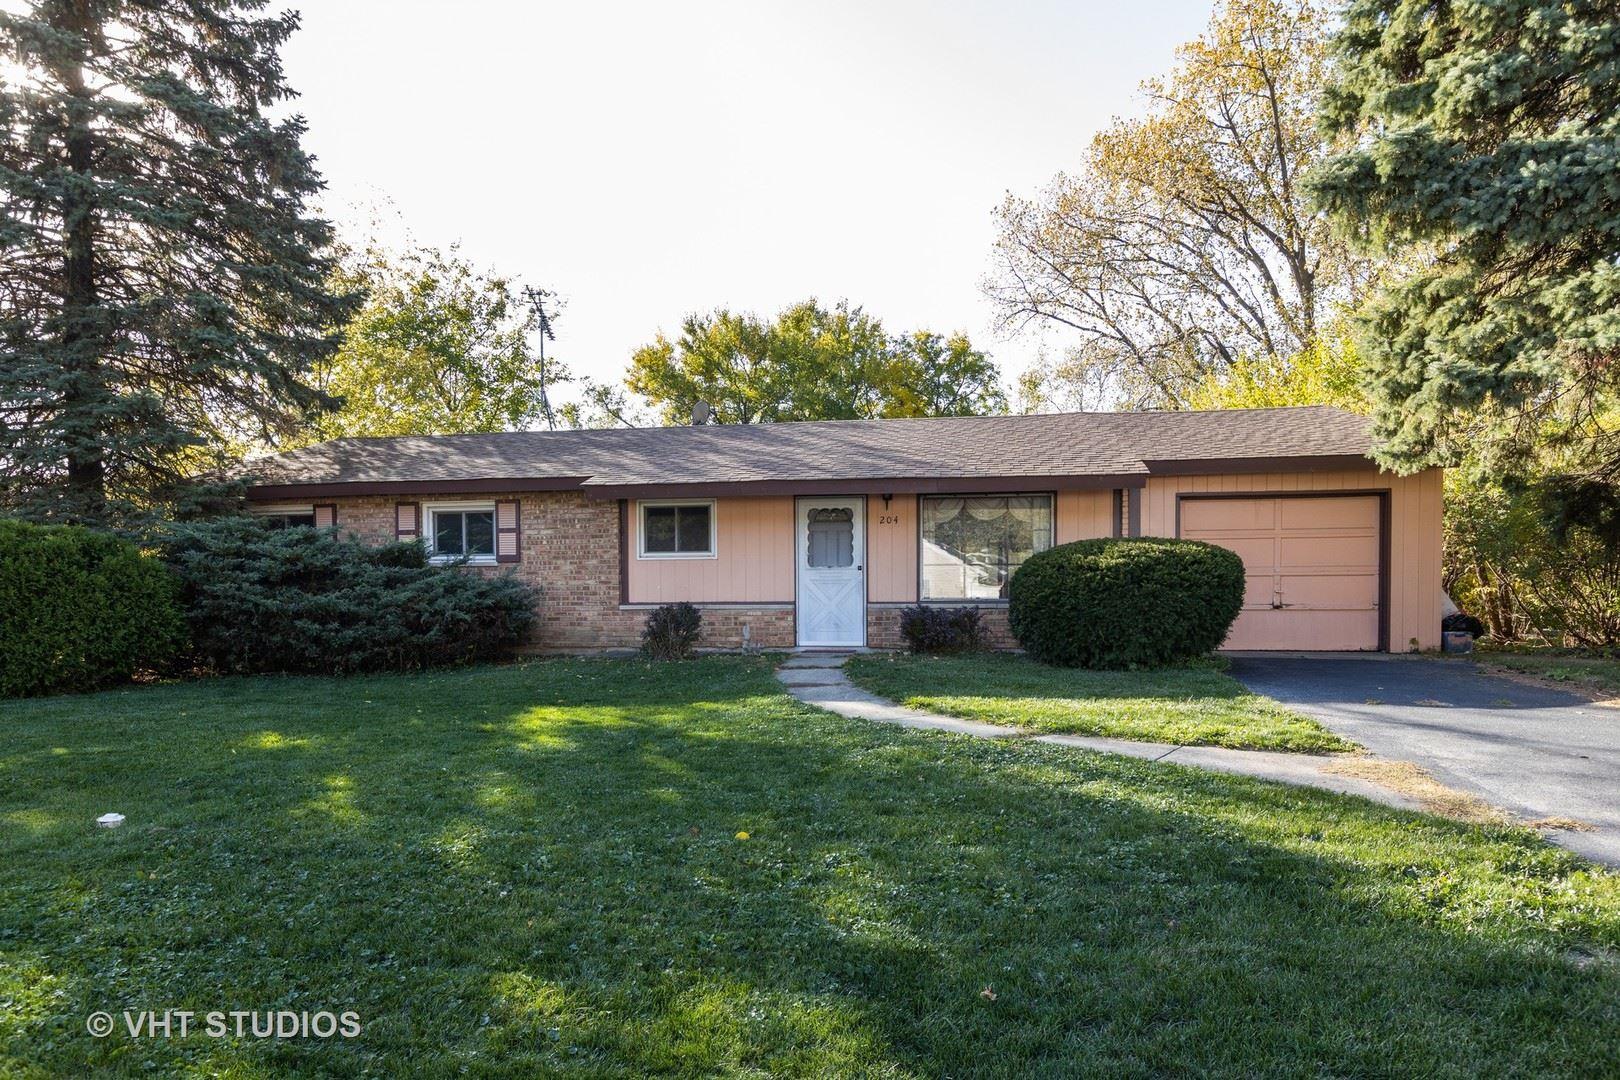 Photo of 204 Glengary Drive, Bolingbrook, IL 60440 (MLS # 10902823)